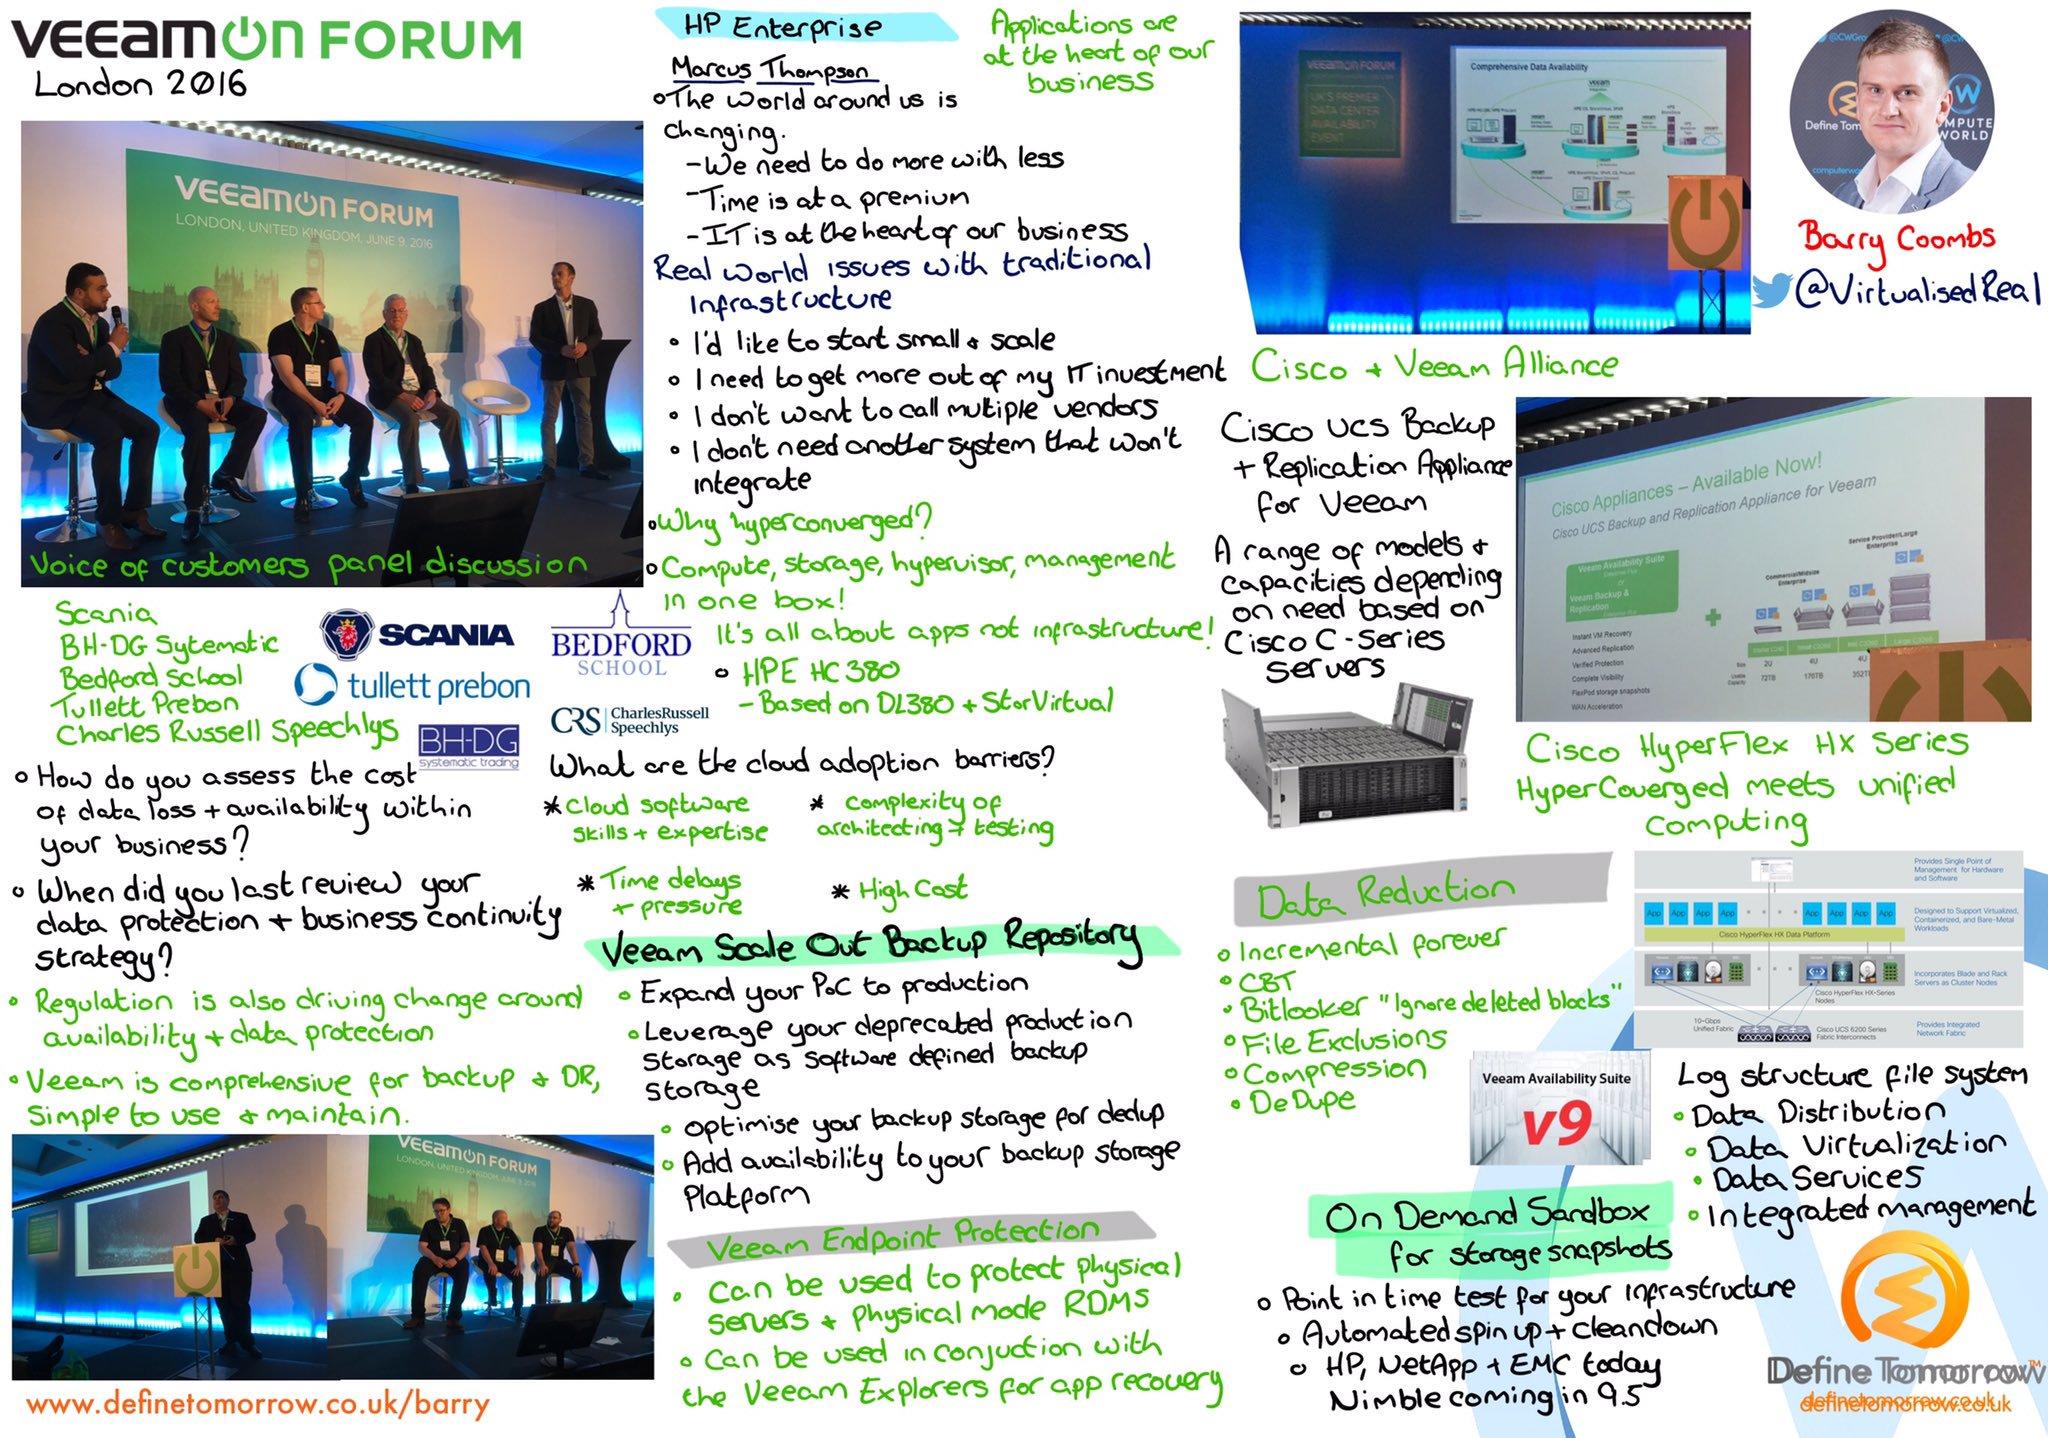 VeeamOnForum2016_4.jpg